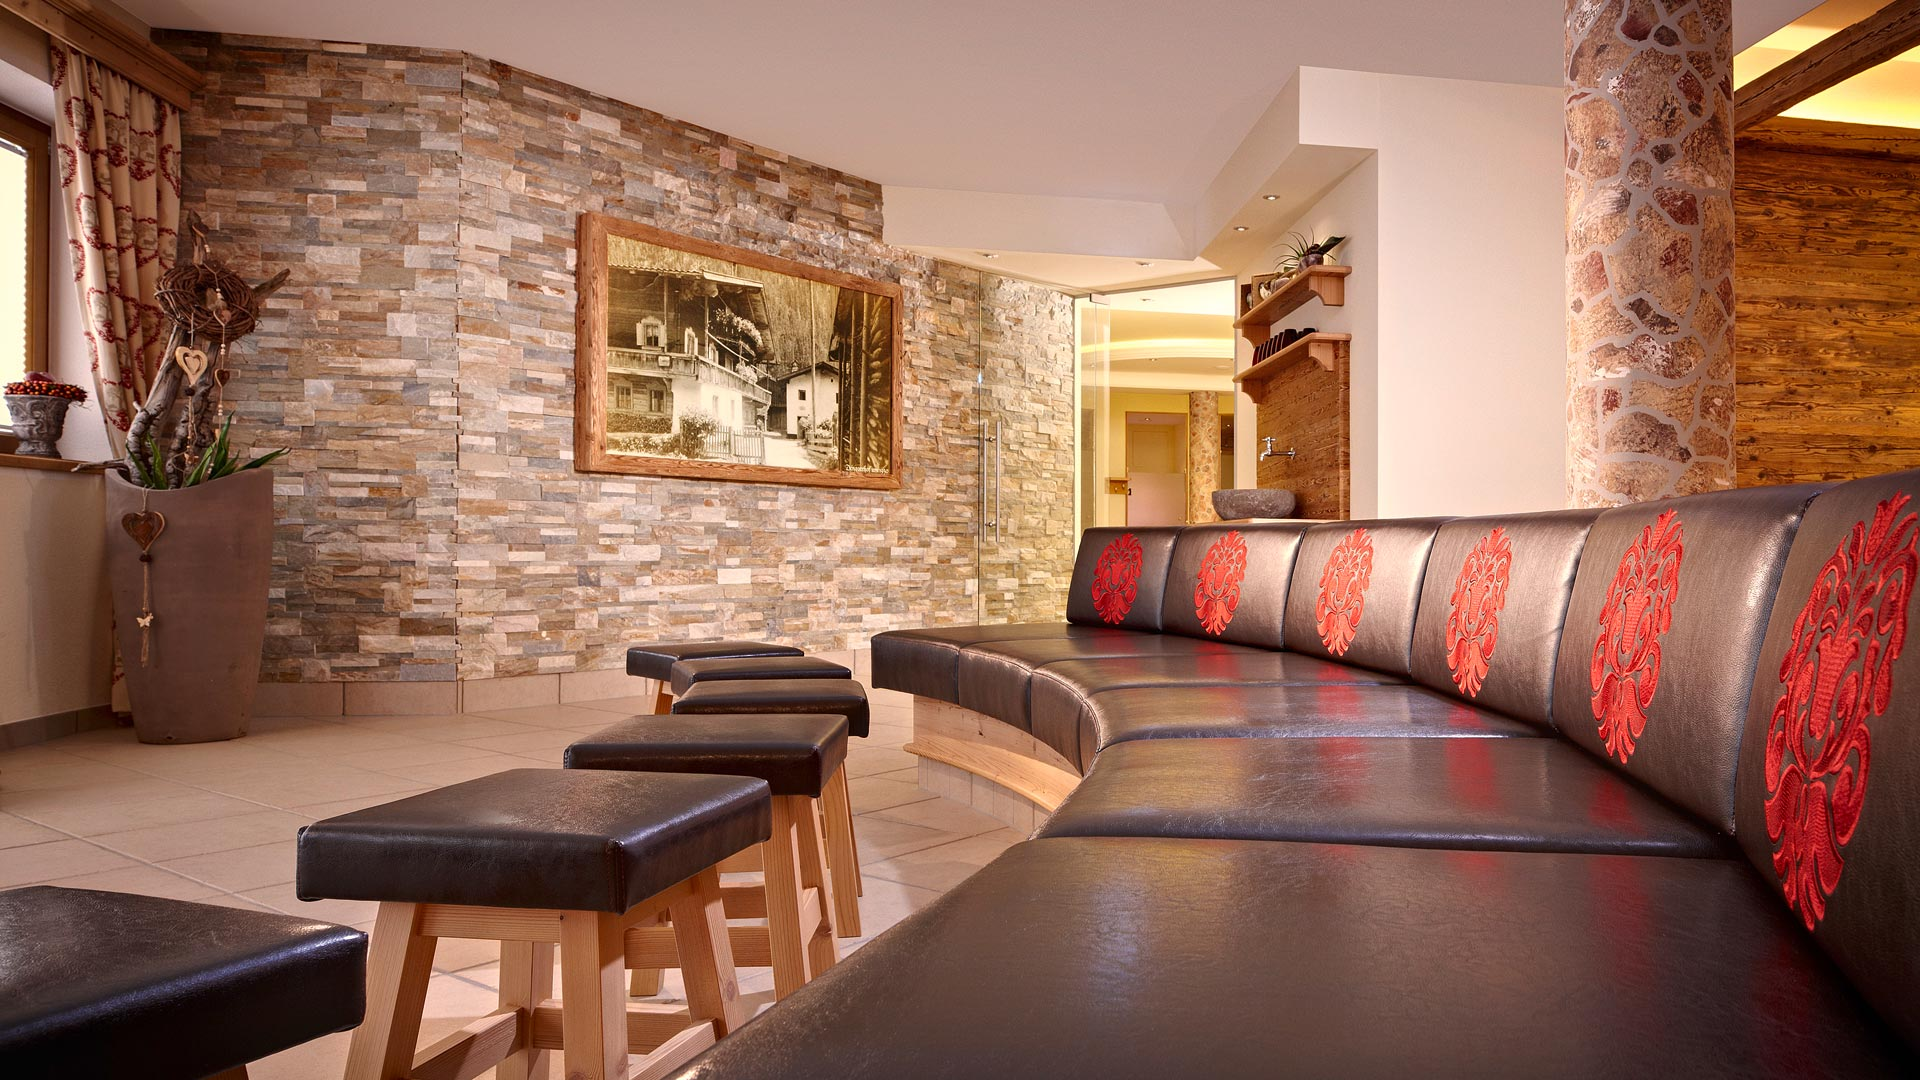 Vitalwelt raumgestaltung eberl sauna for Individuelle raumgestaltung